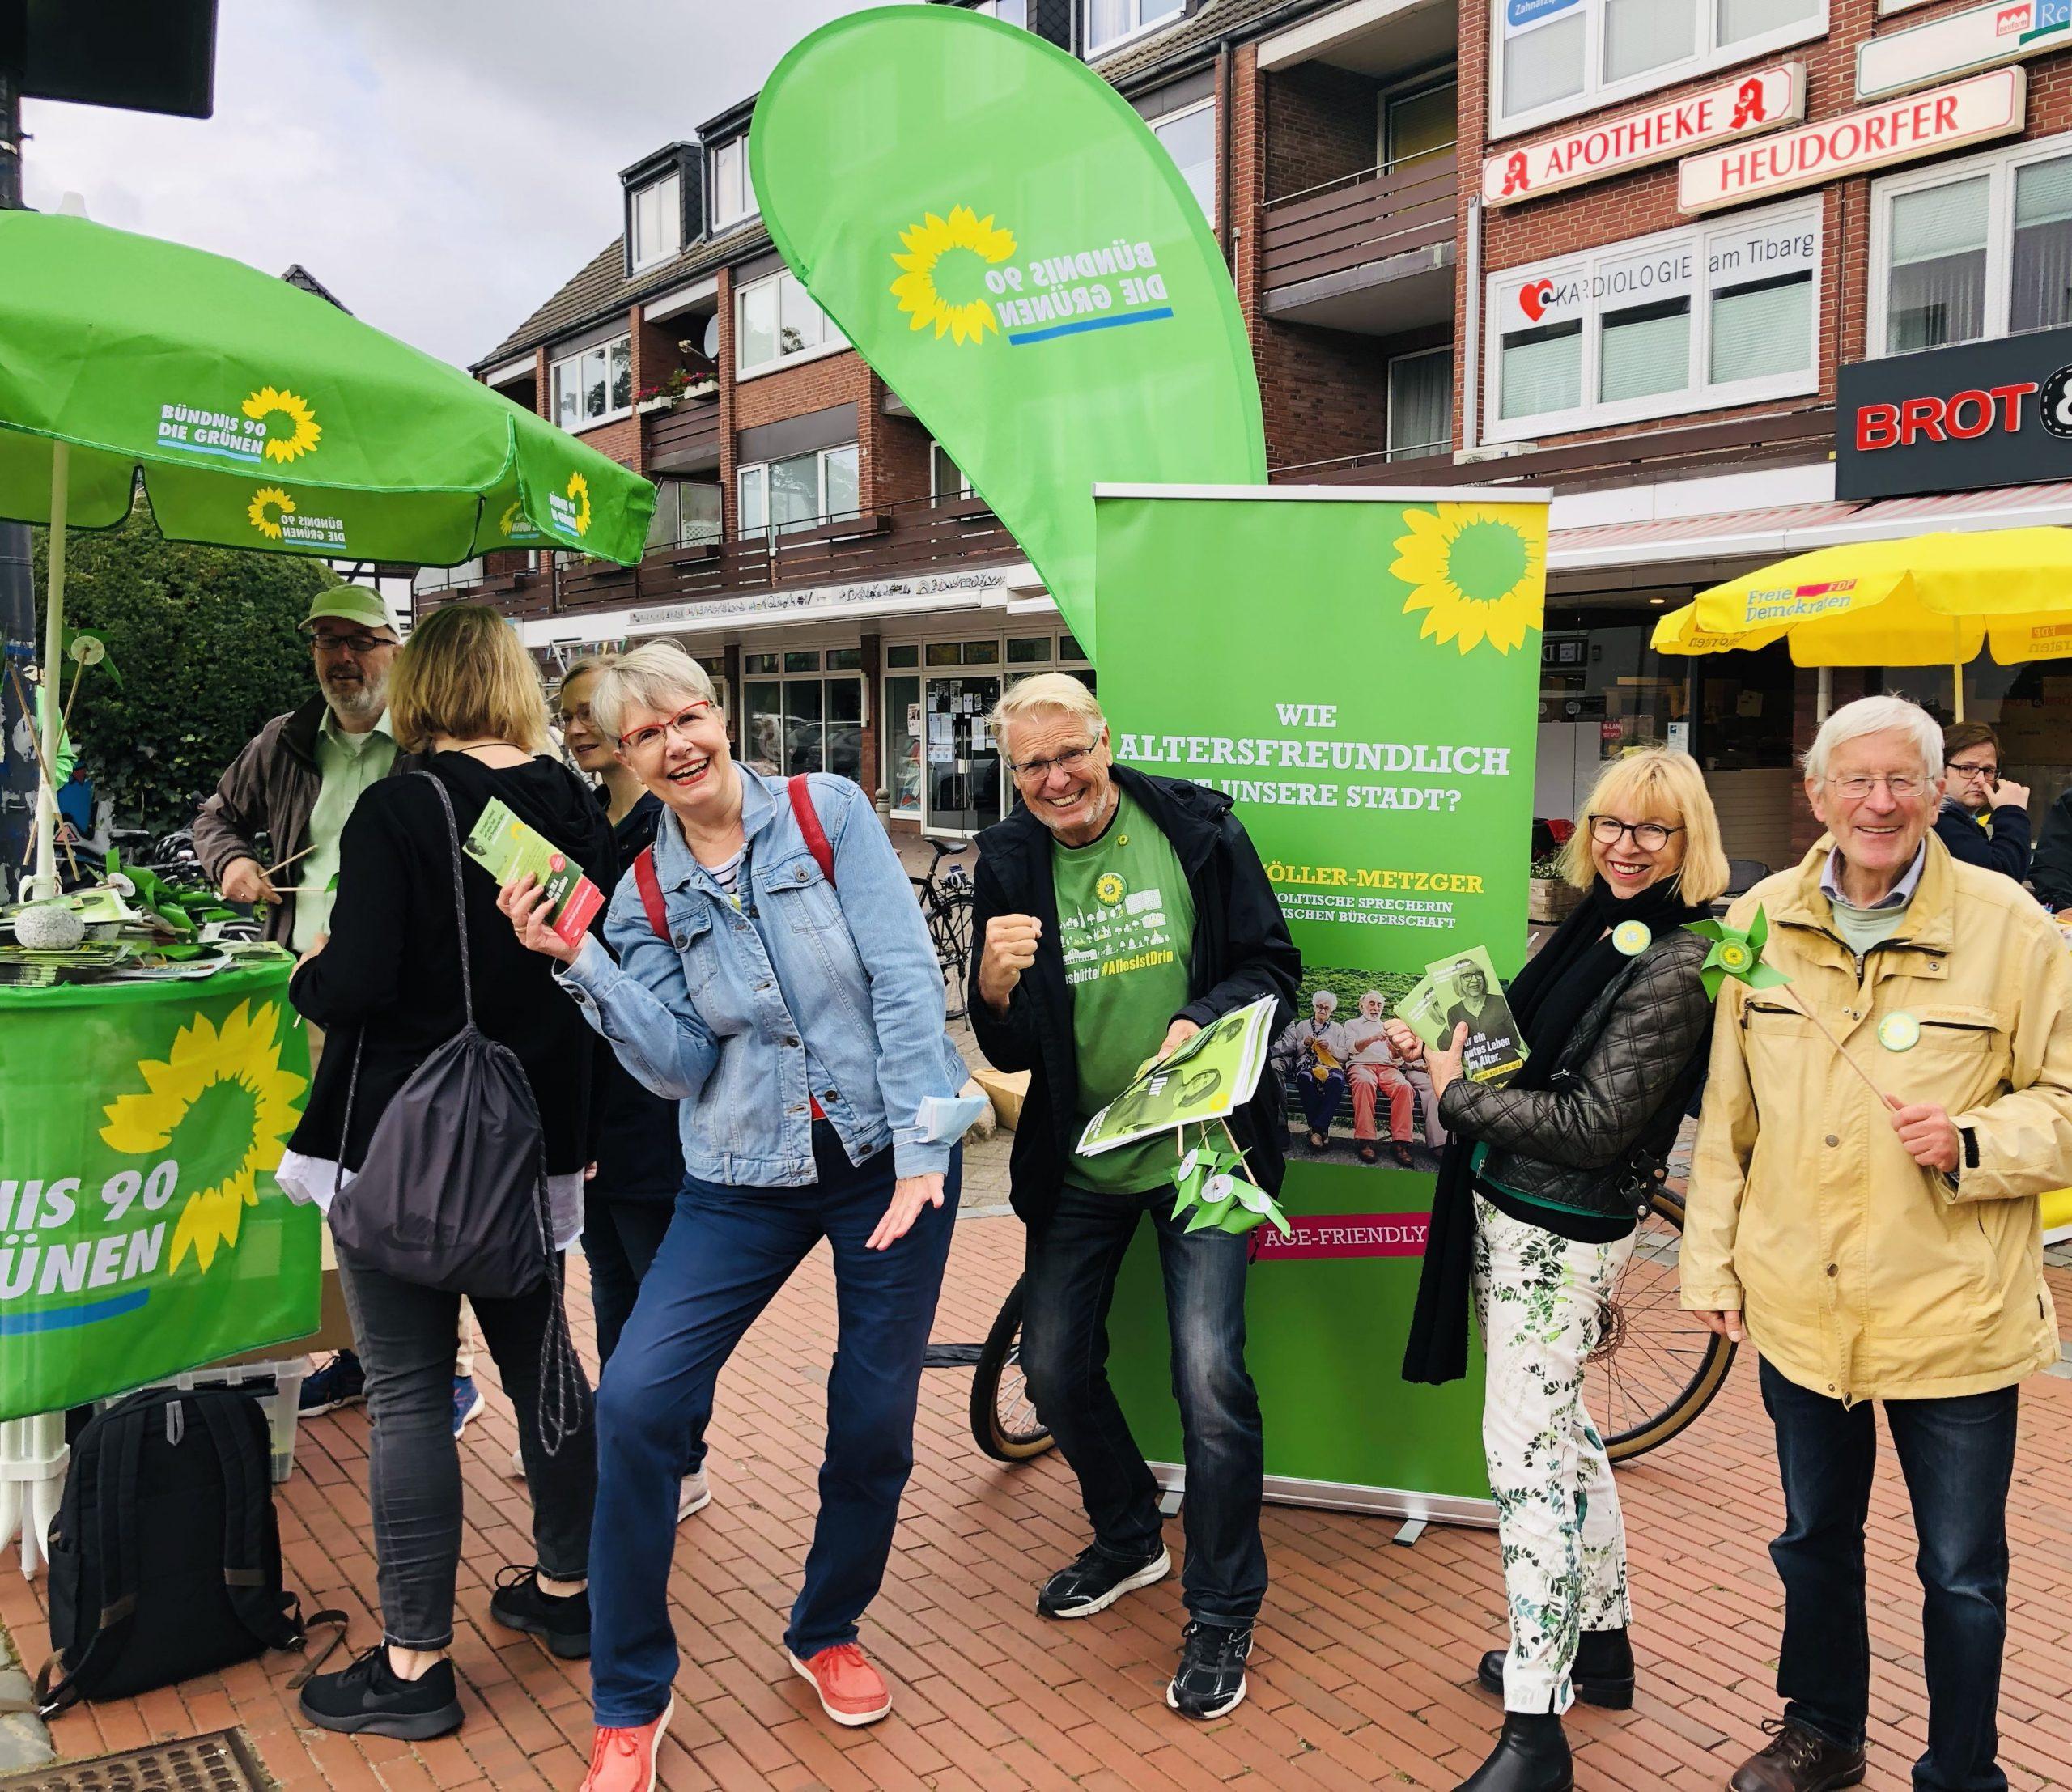 Campaigning in Niendorf